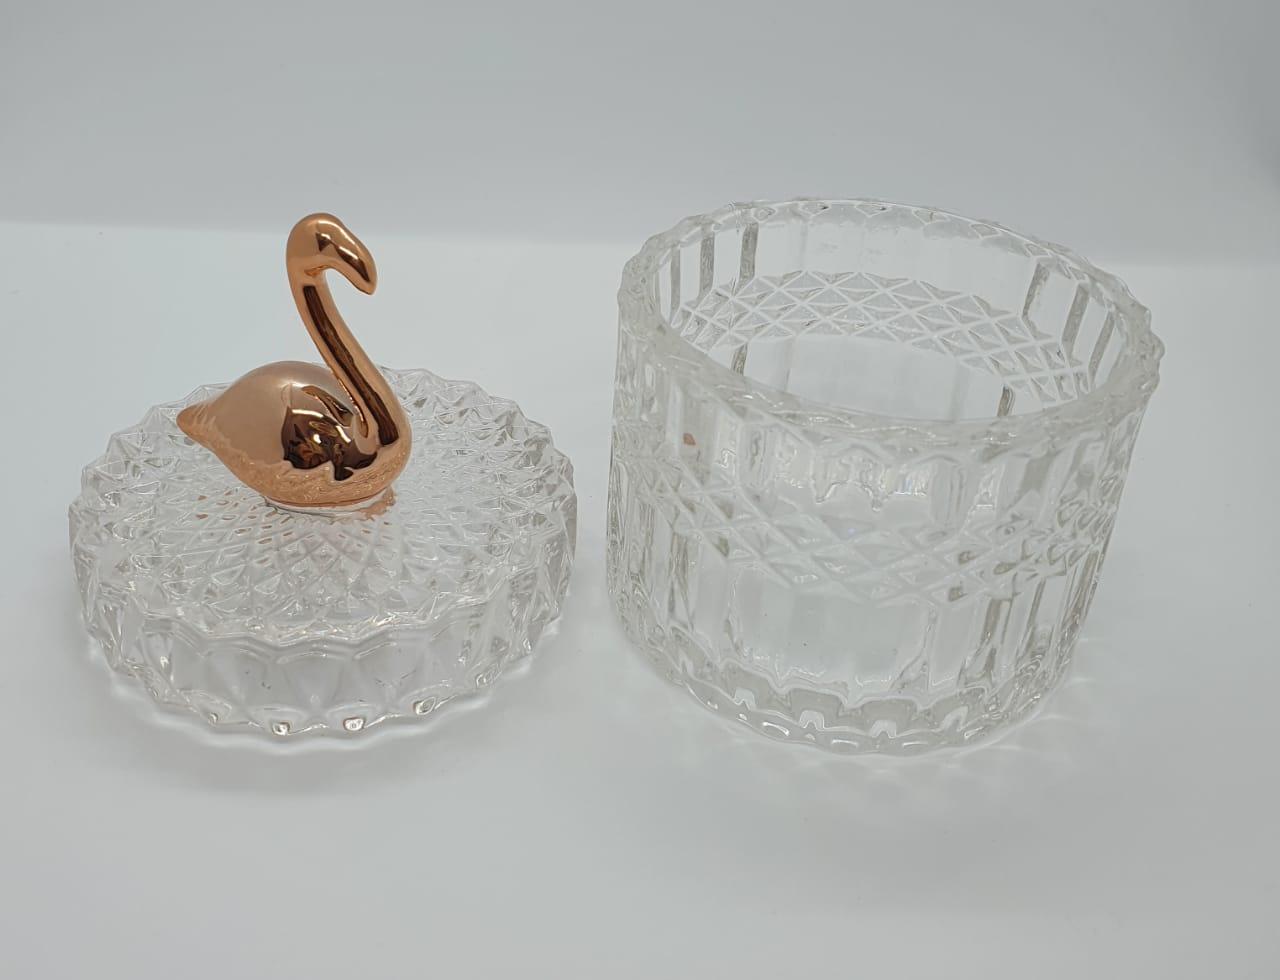 Porta joias redondo em vidro - Flamingo rese gold